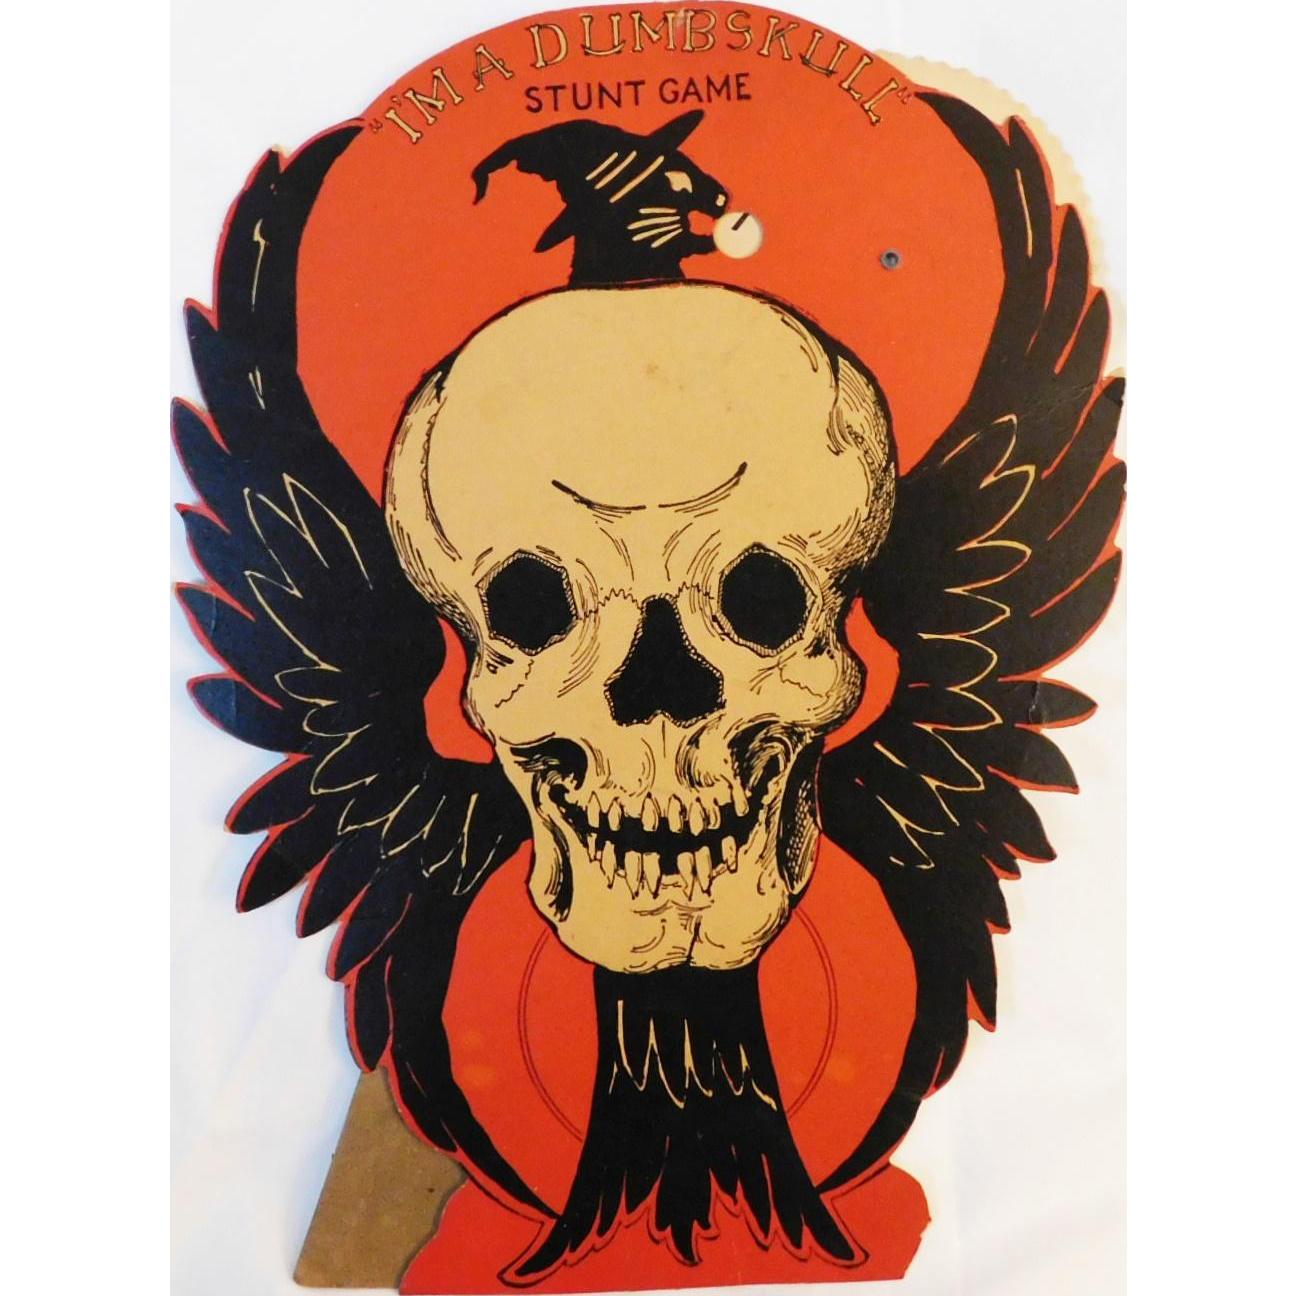 I M A Dumb Skull Stunt Game Halloween Decoration Beistle Company 1930 1931 Hard To Find Rare Vintage Halloween Retro Halloween Vintage Halloween Decorations